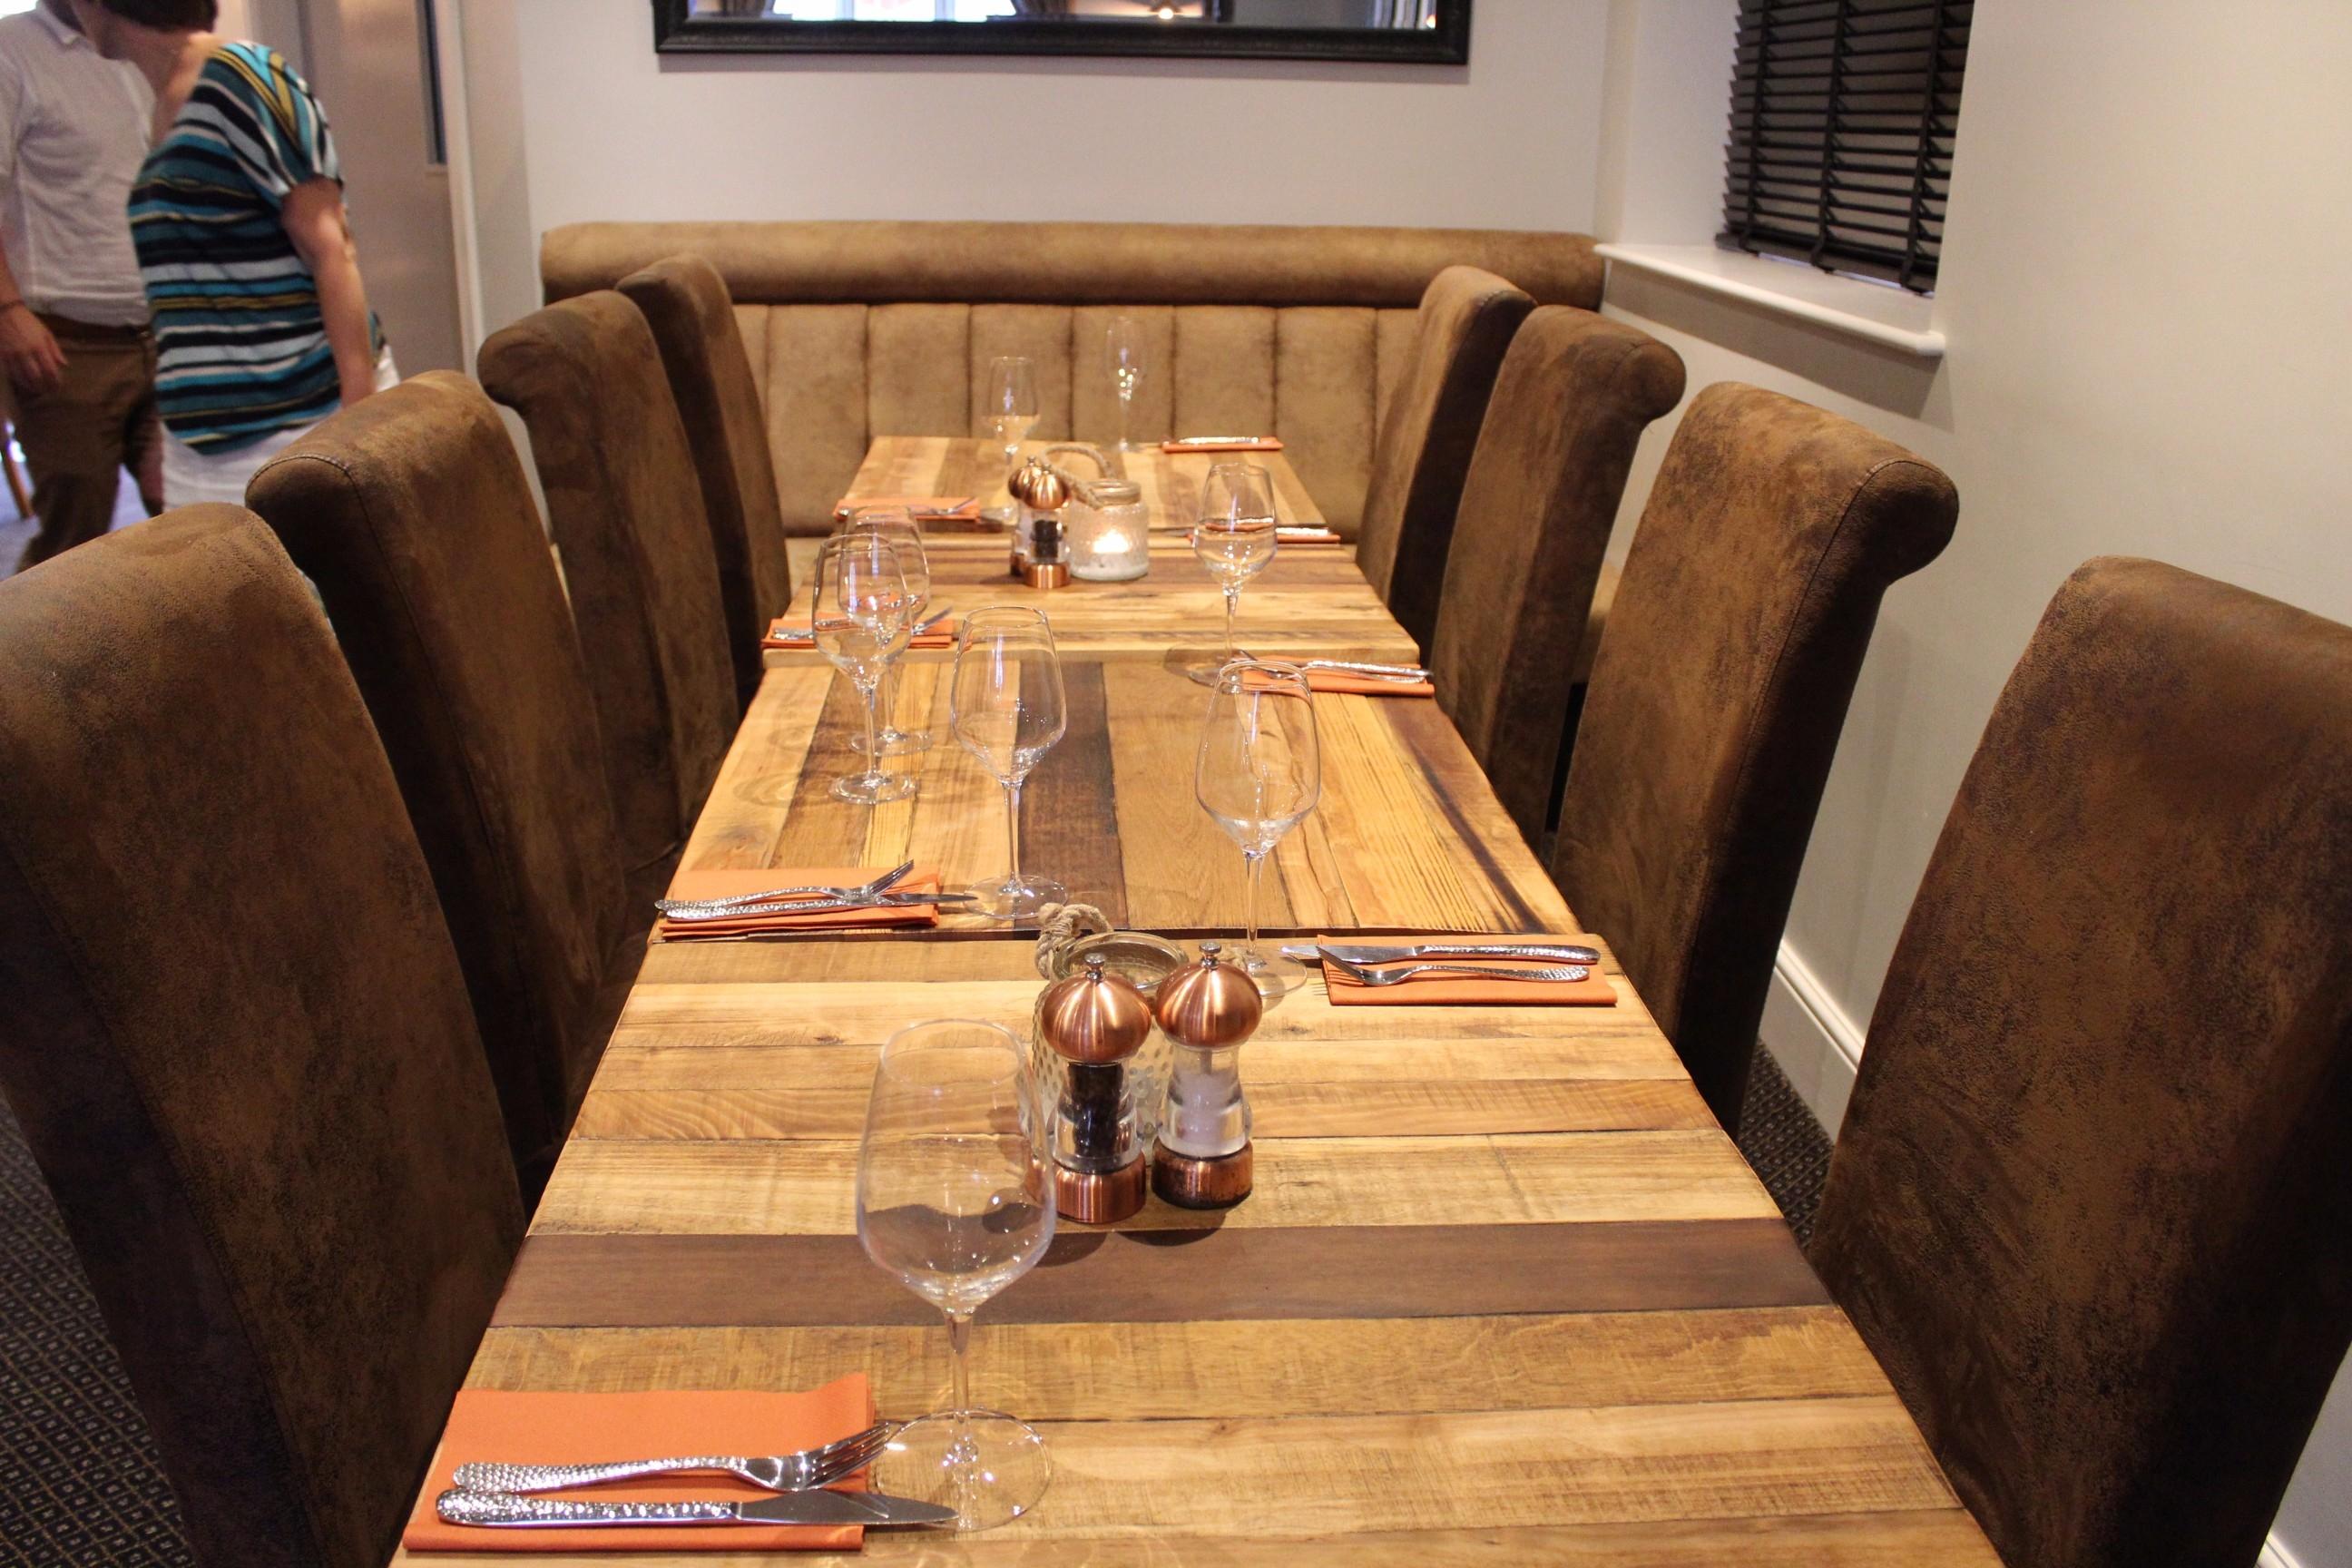 stamfords steak restaurant pocklington (5)